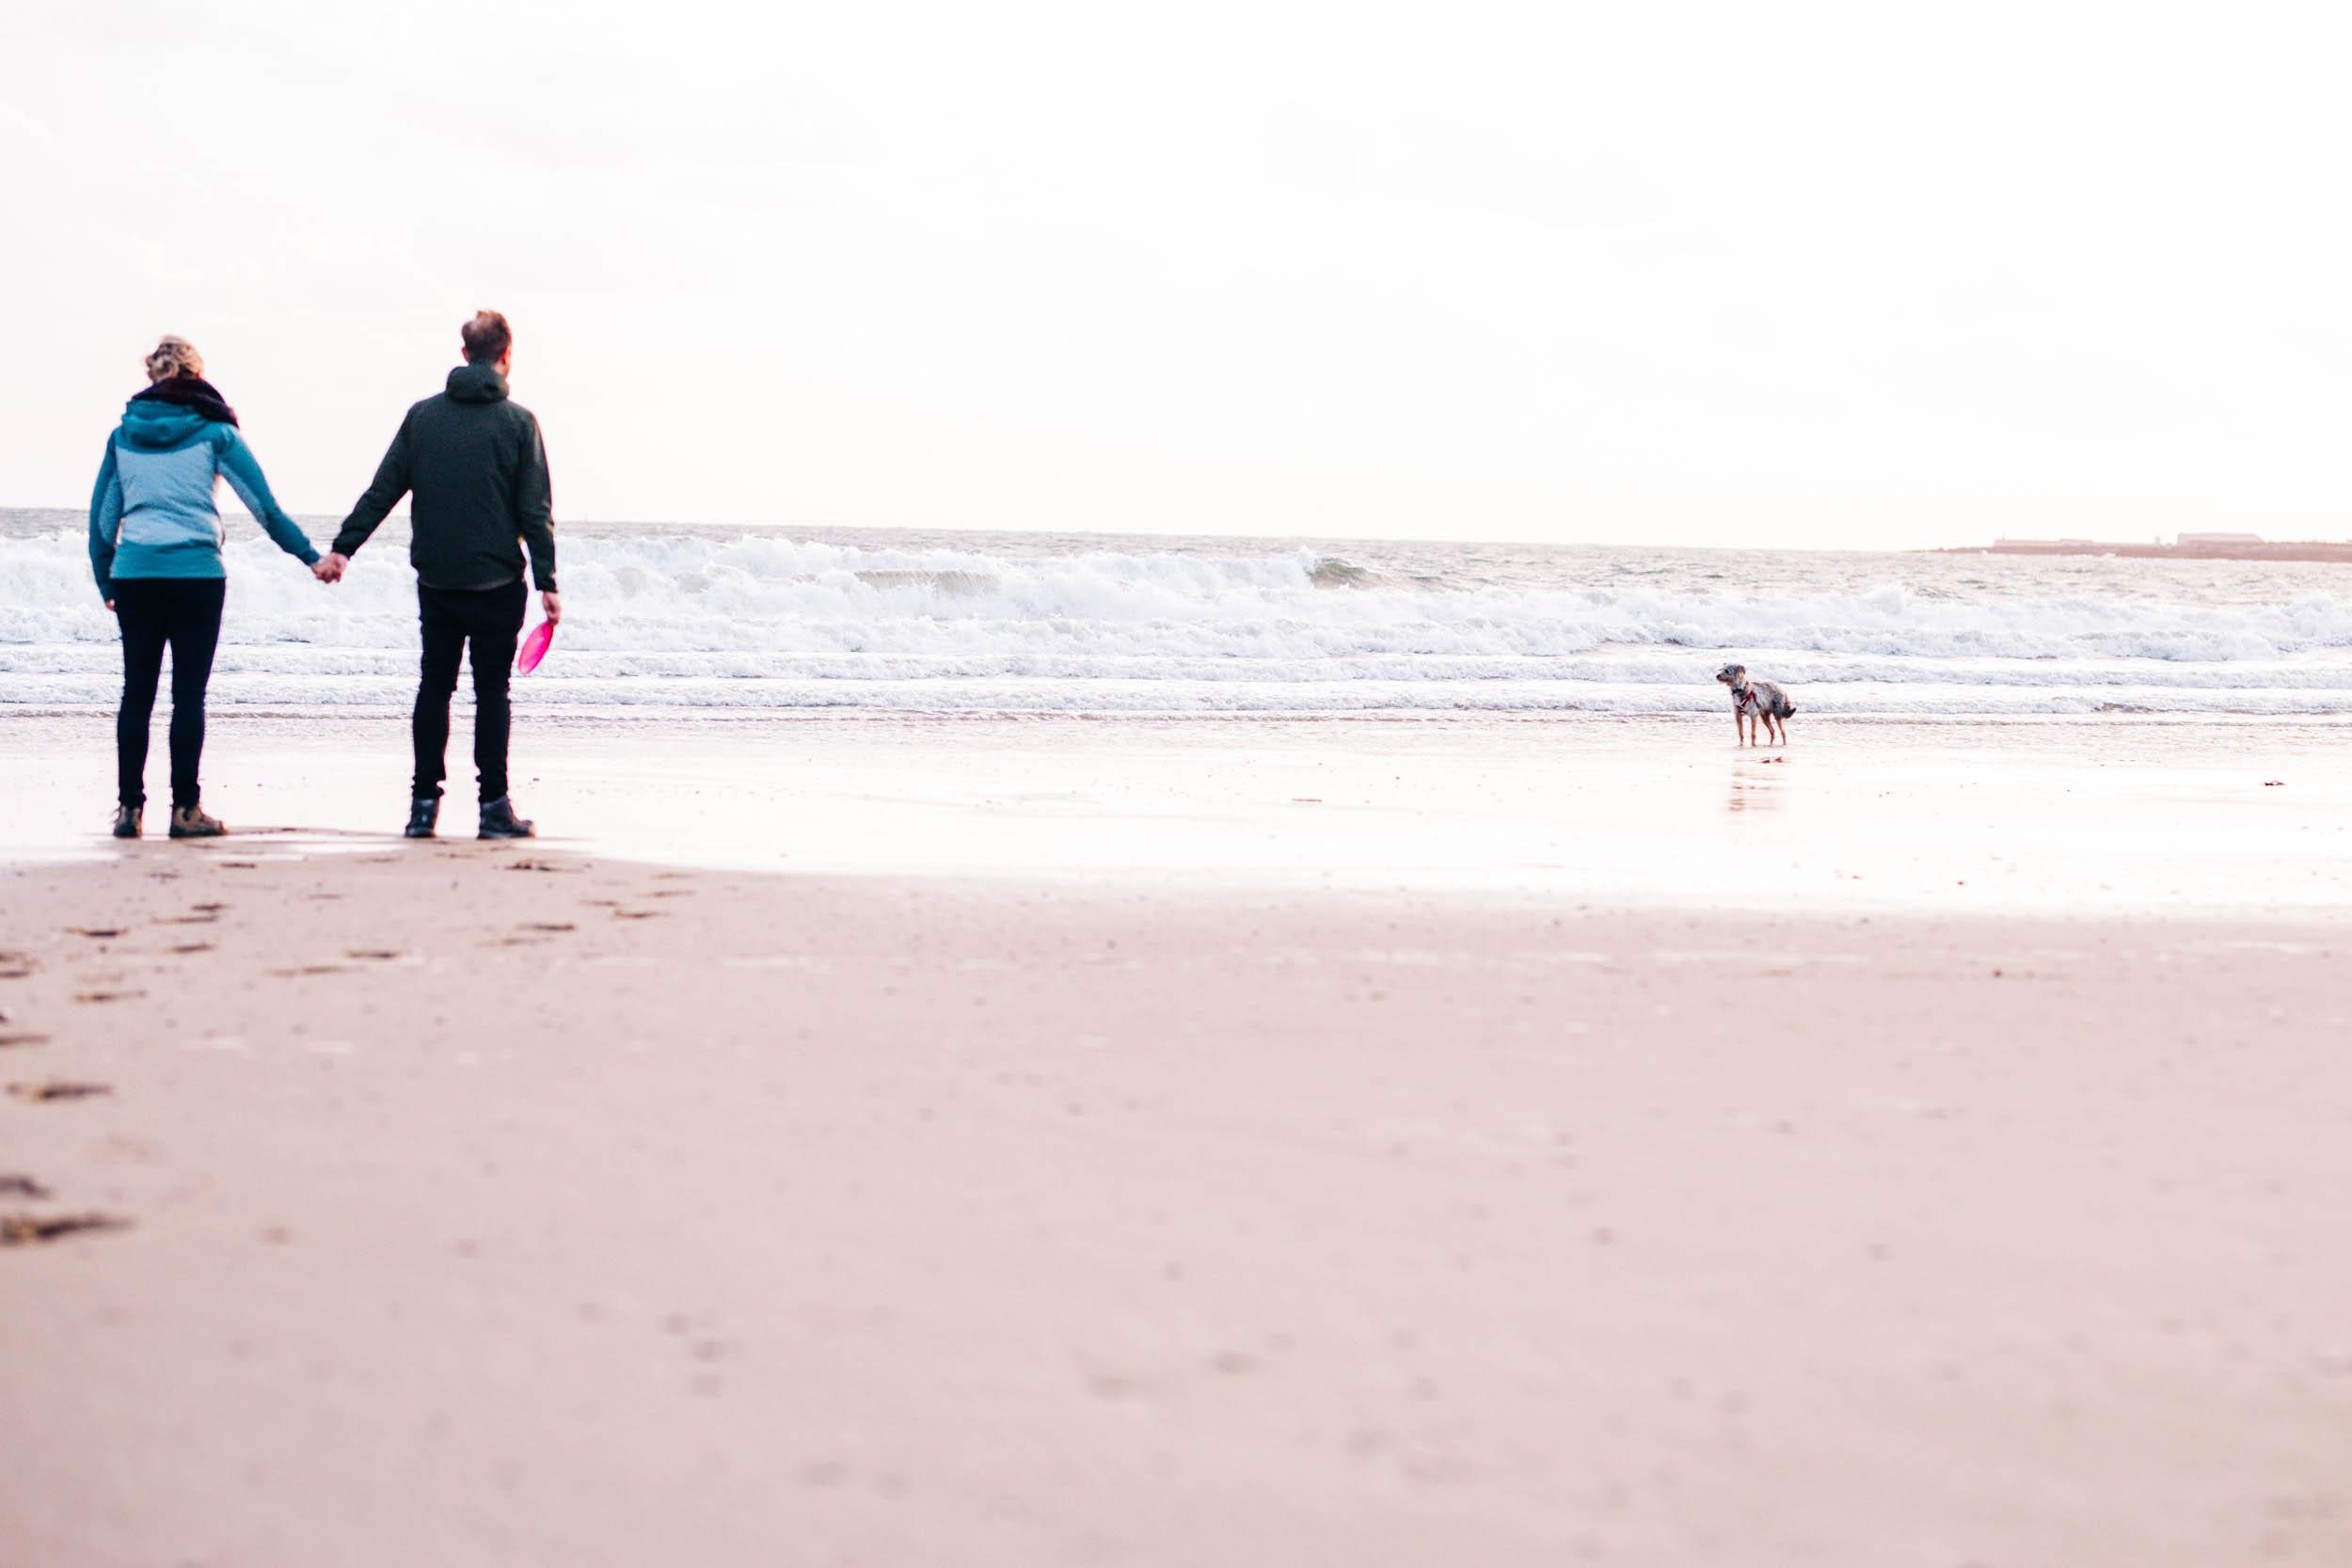 Alex_Sedgmond_Photography-MerthyrMawr-PreweddingPhotography-Penny&Mike-9.jpg